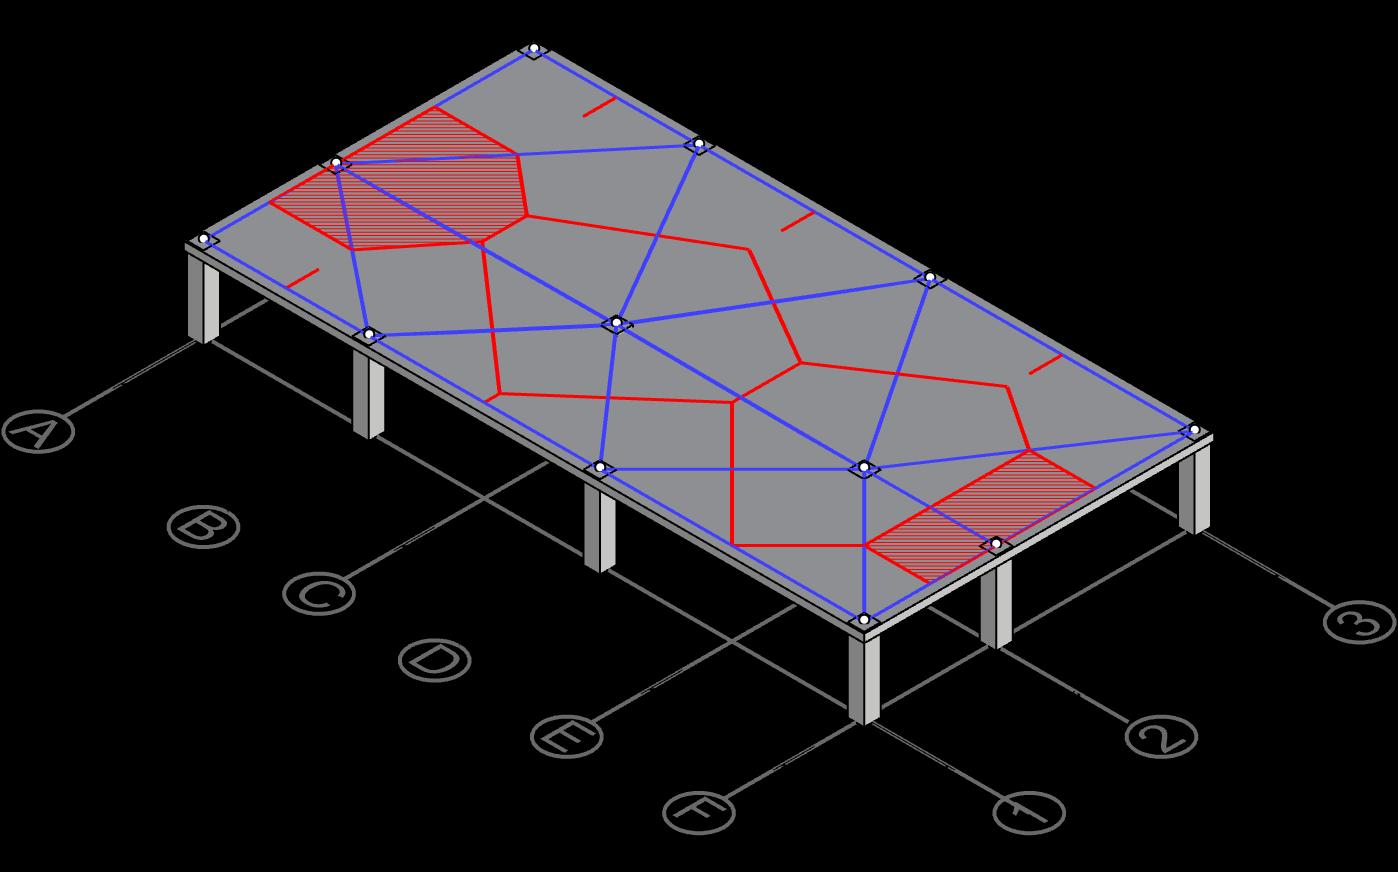 Derive centerline polygon for column A-2 and F-2